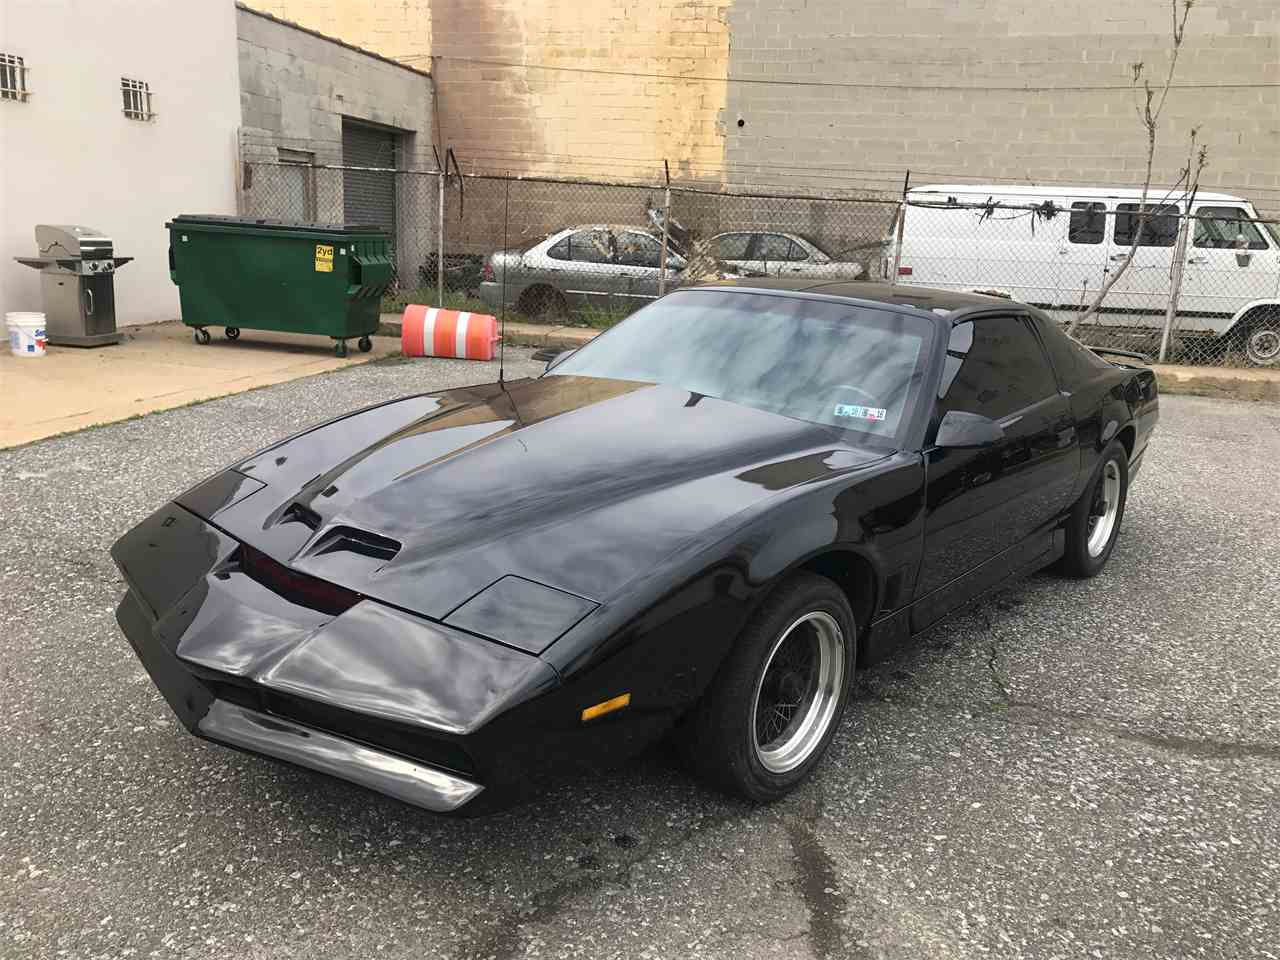 Used 1988 Pontiac Firebird Trans Am GTA For Sale - CarGurus